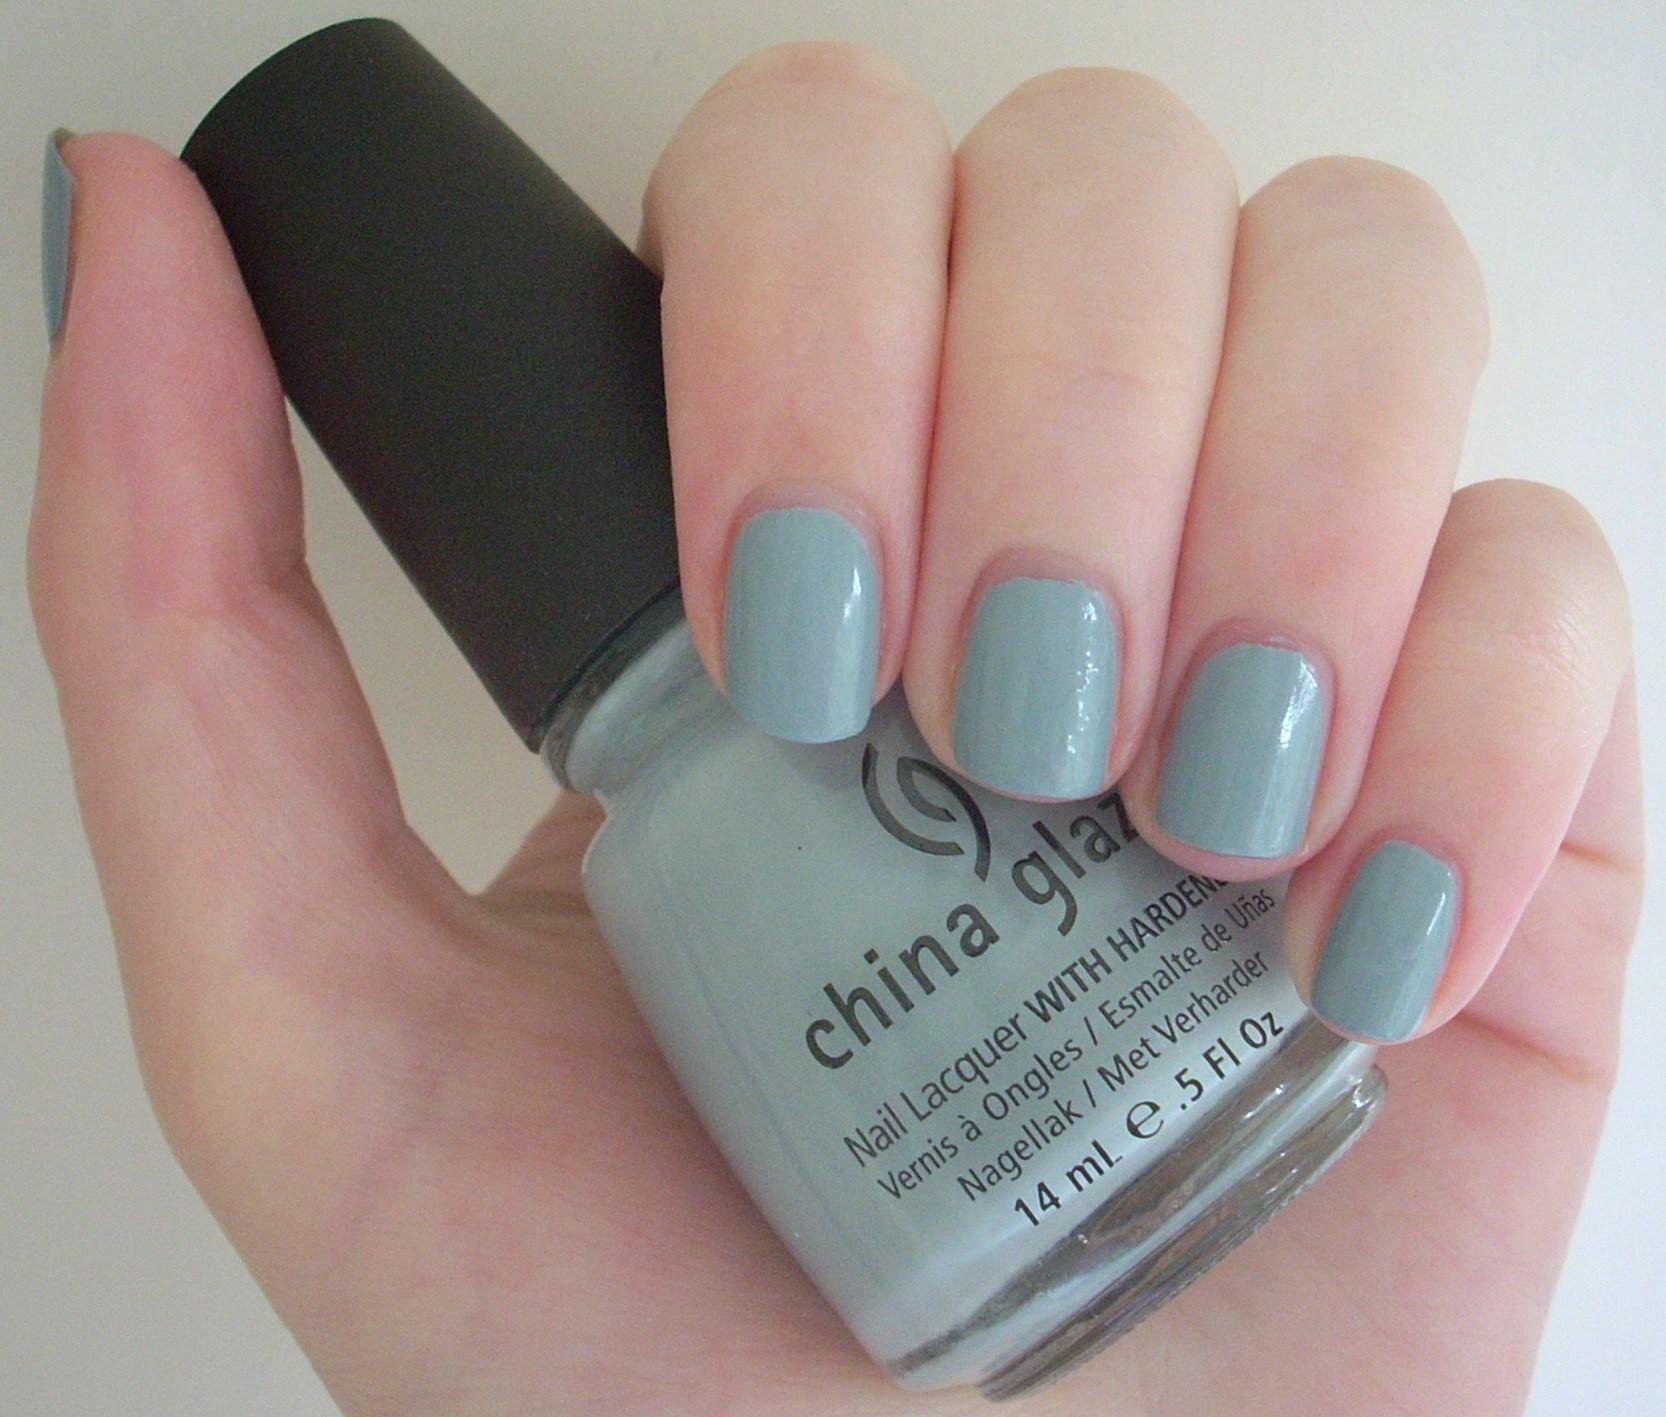 Spray on nail polish china glaze nail spray reviews - China Glaze Sea Spray Over A Week Without A Nail Polish